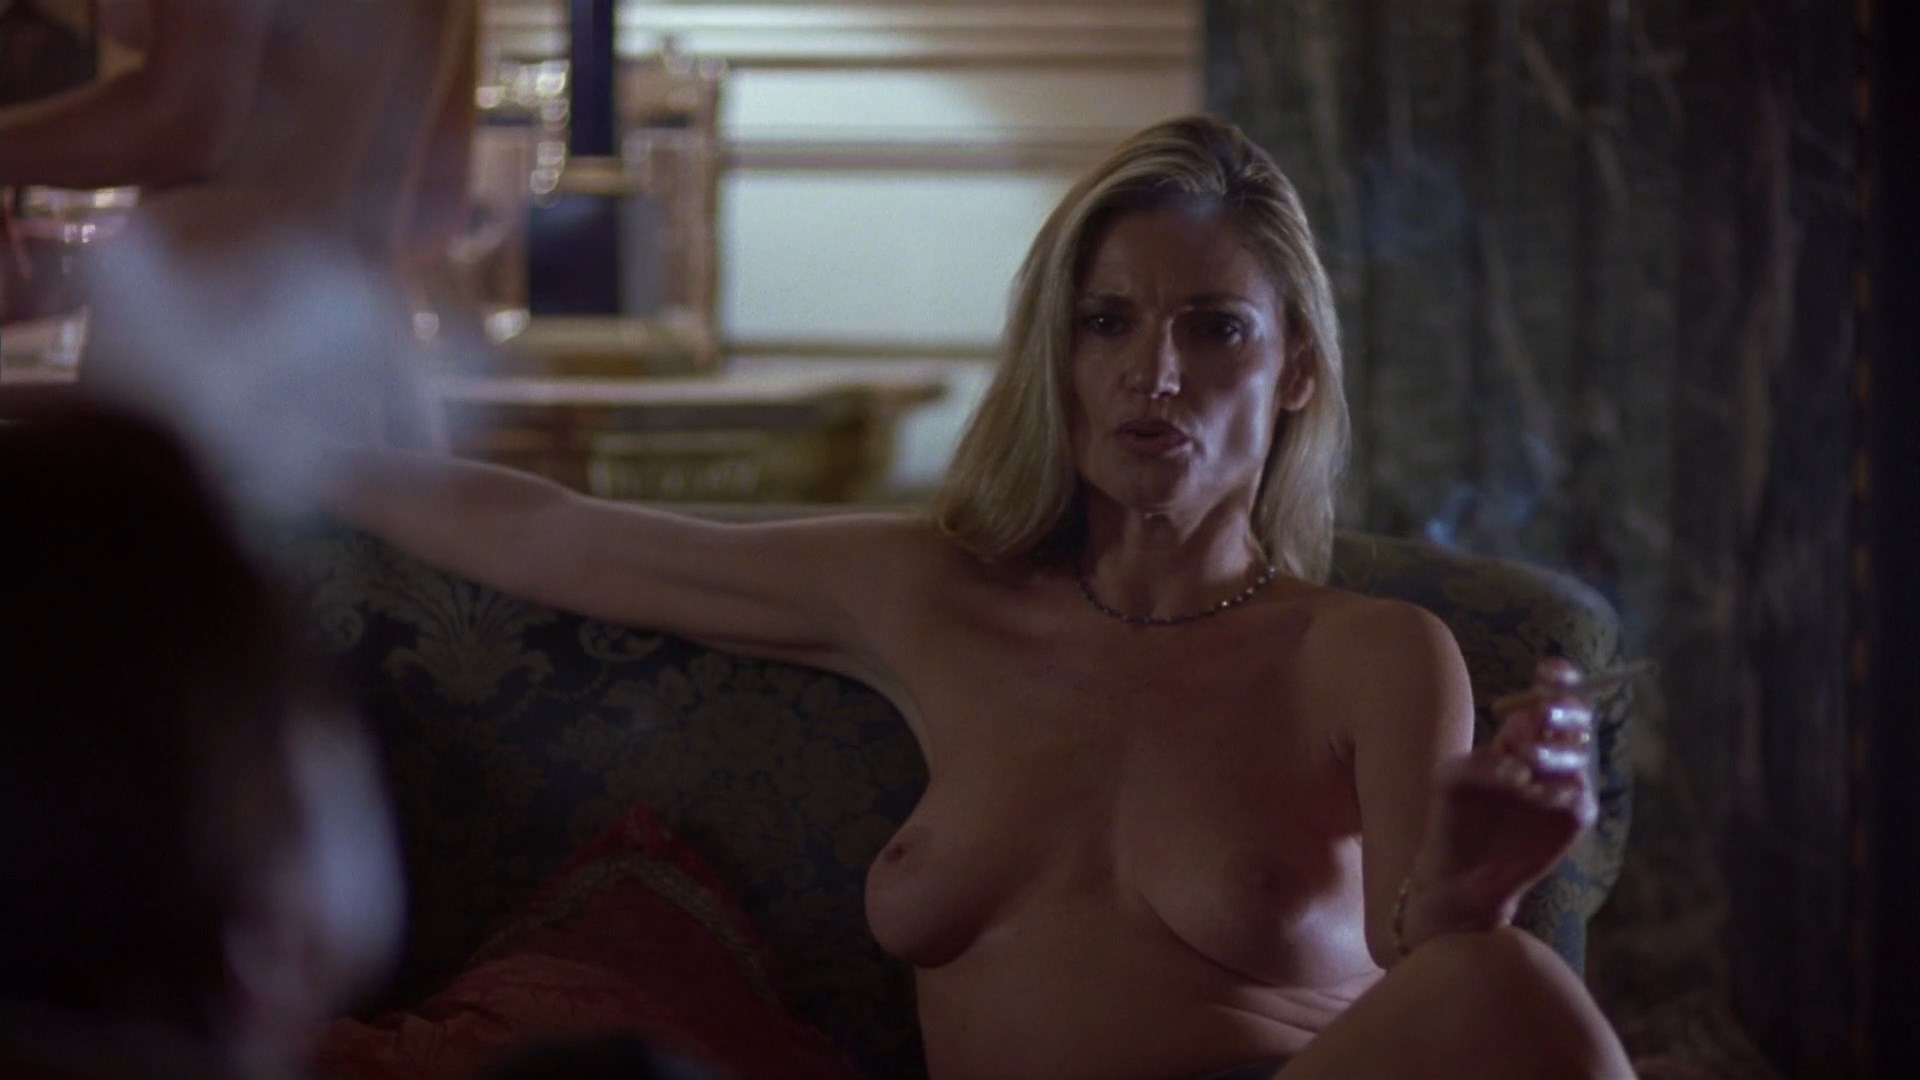 Magnificent caroline white sex explicit nude topless